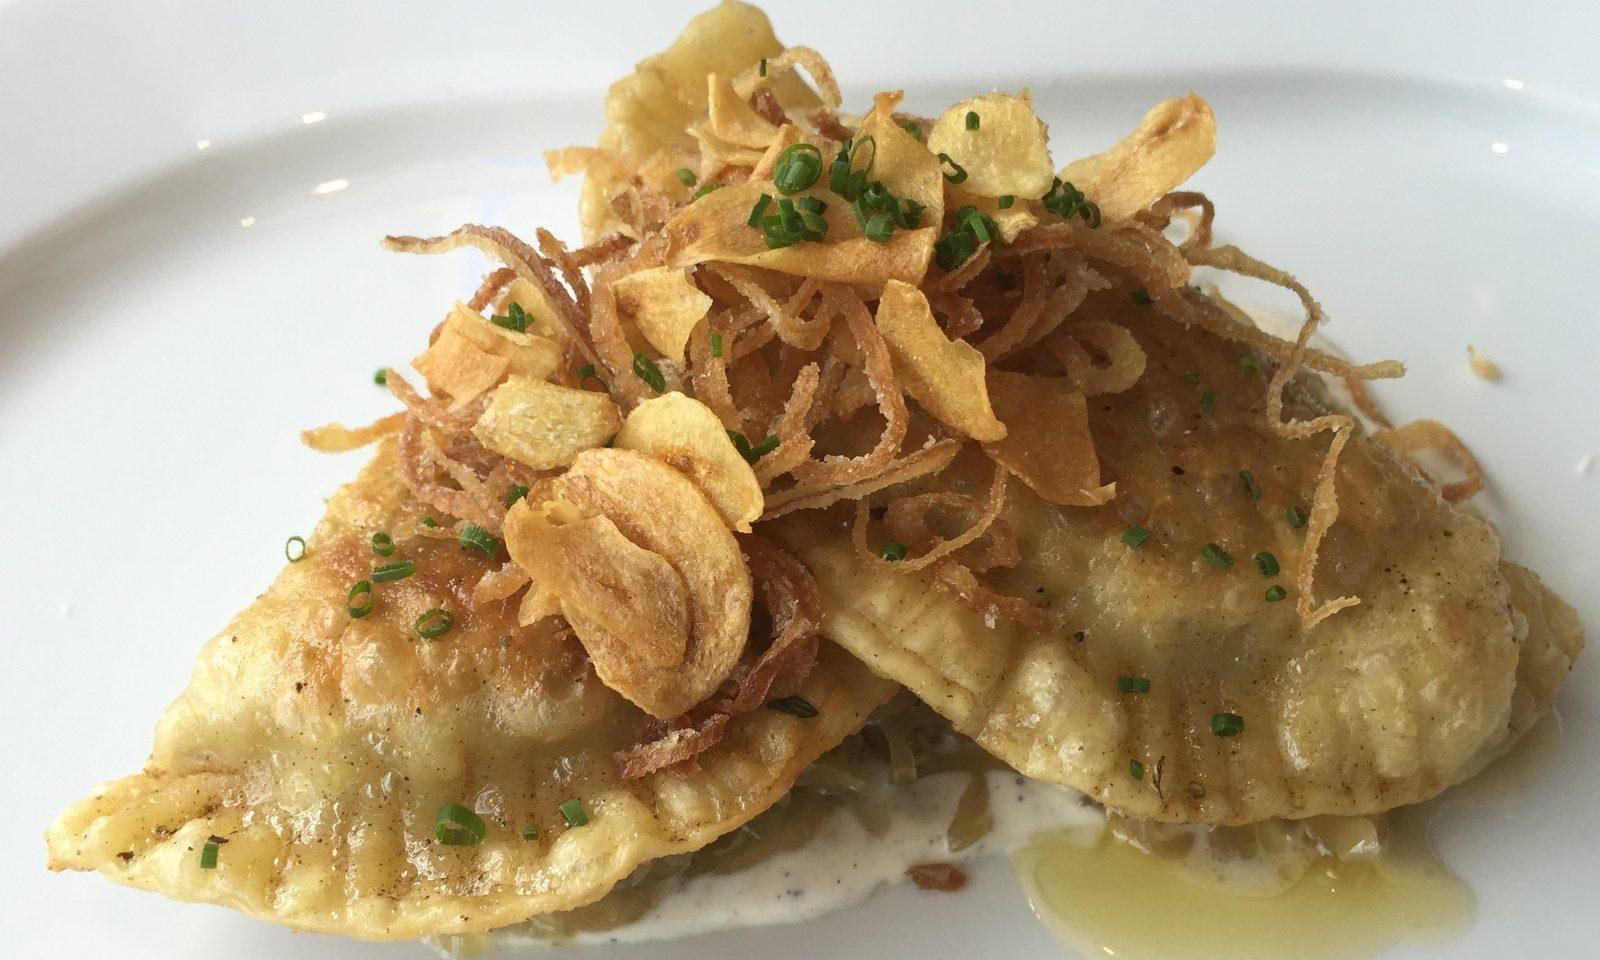 Potato-leek pierogi with fried shallots and garlic, housemade sauerkraut at Patina 250. (Andrew Galarneau/Buffalo News)